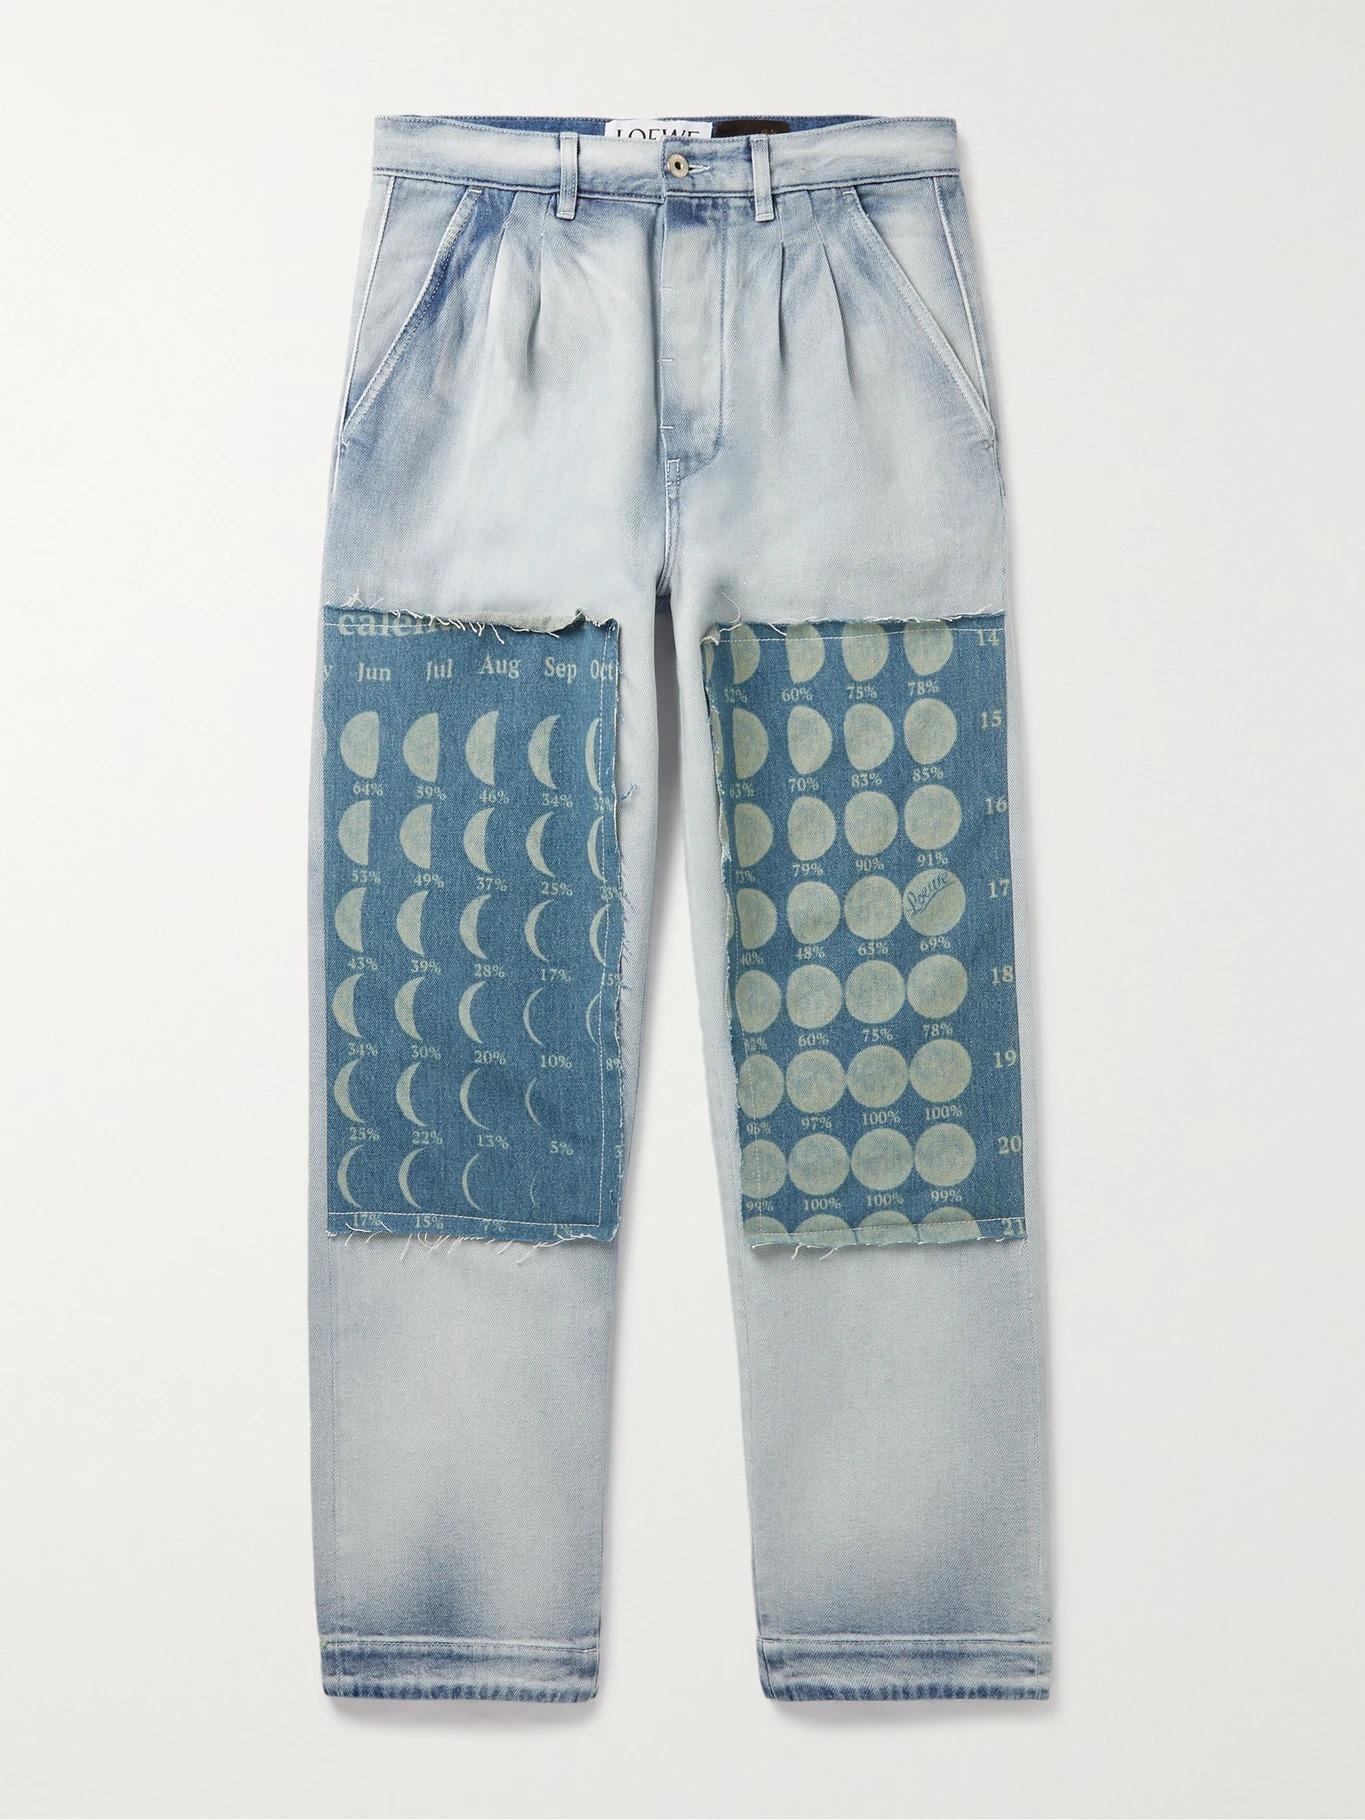 Loewe + Paula's Ibiza Pleated Patchwork Denim Jeans, designer jeans for men